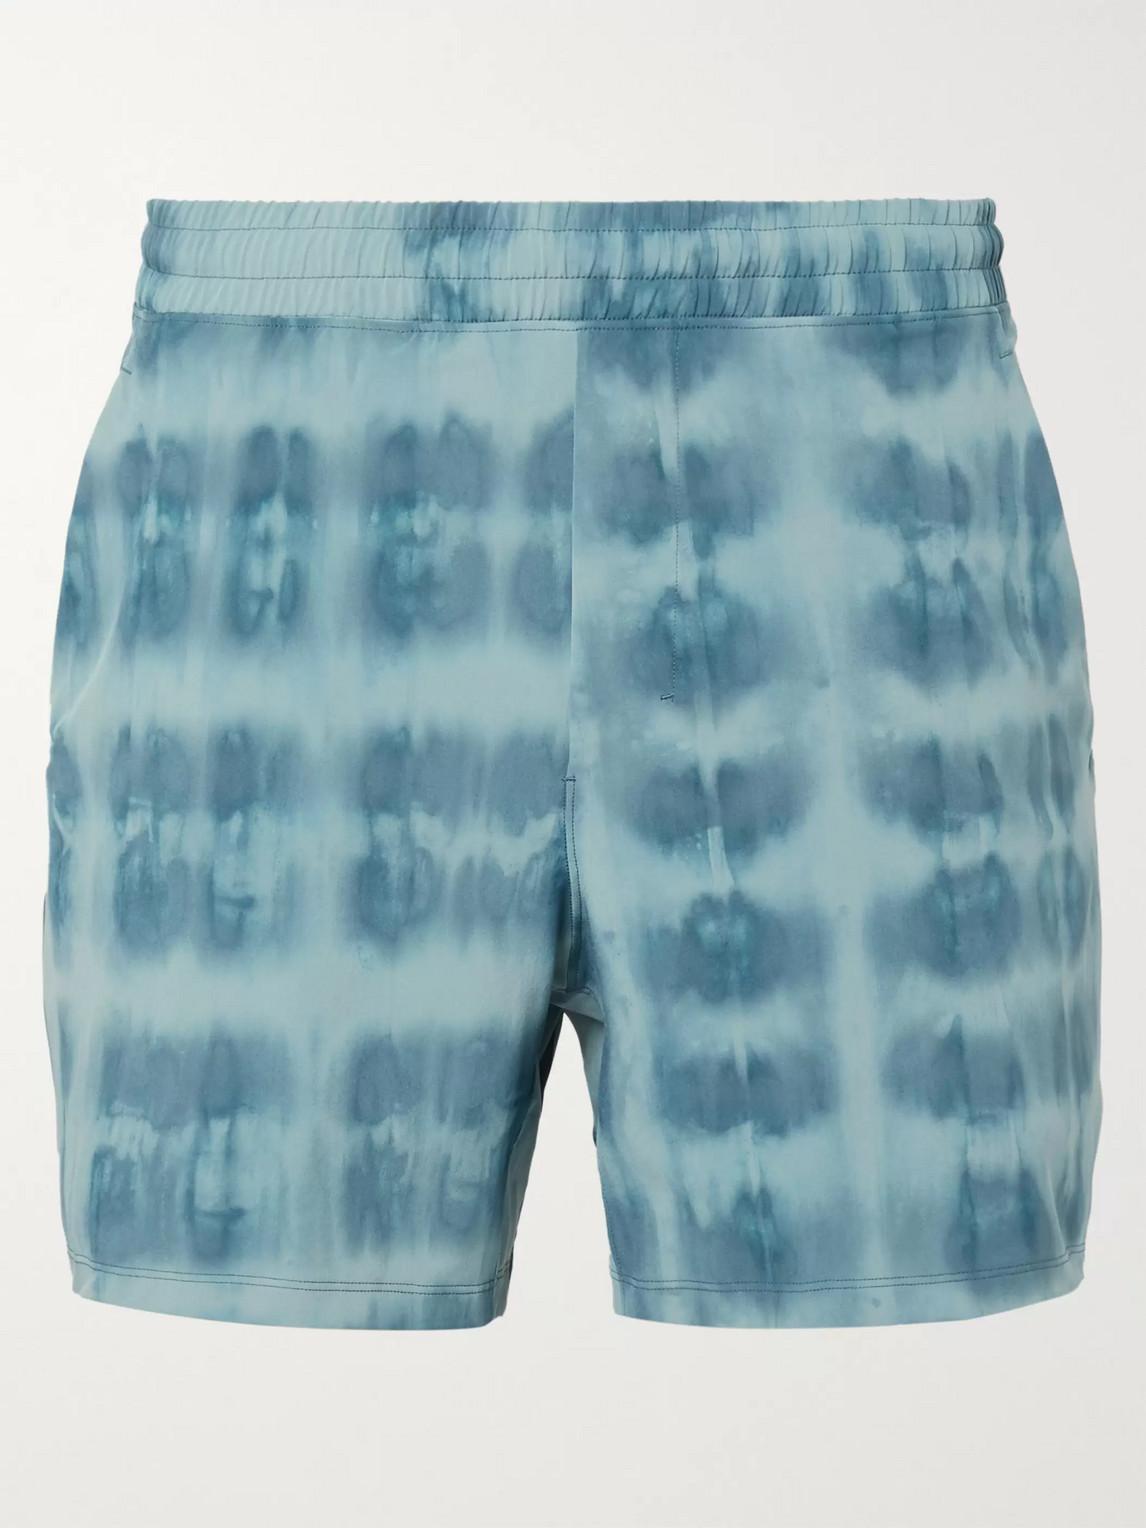 lululemon - pace breaker swift shorts - men - blue